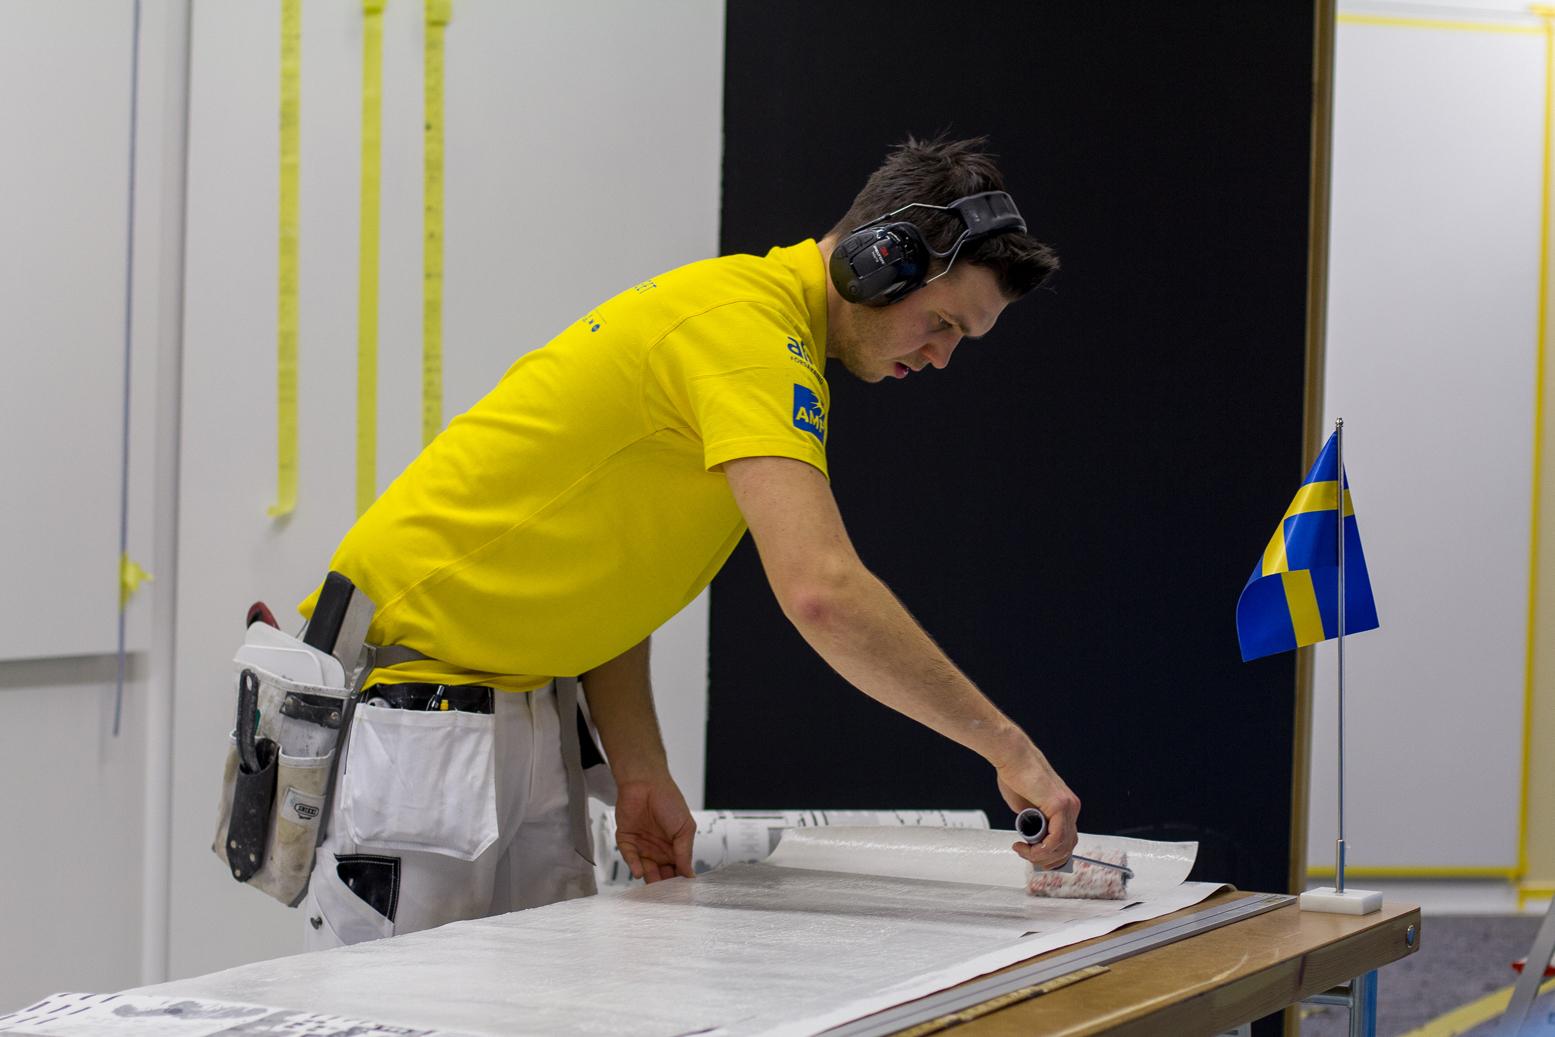 Emil Eriksson under momentet tapetsering. Foto: Thomas Nordin